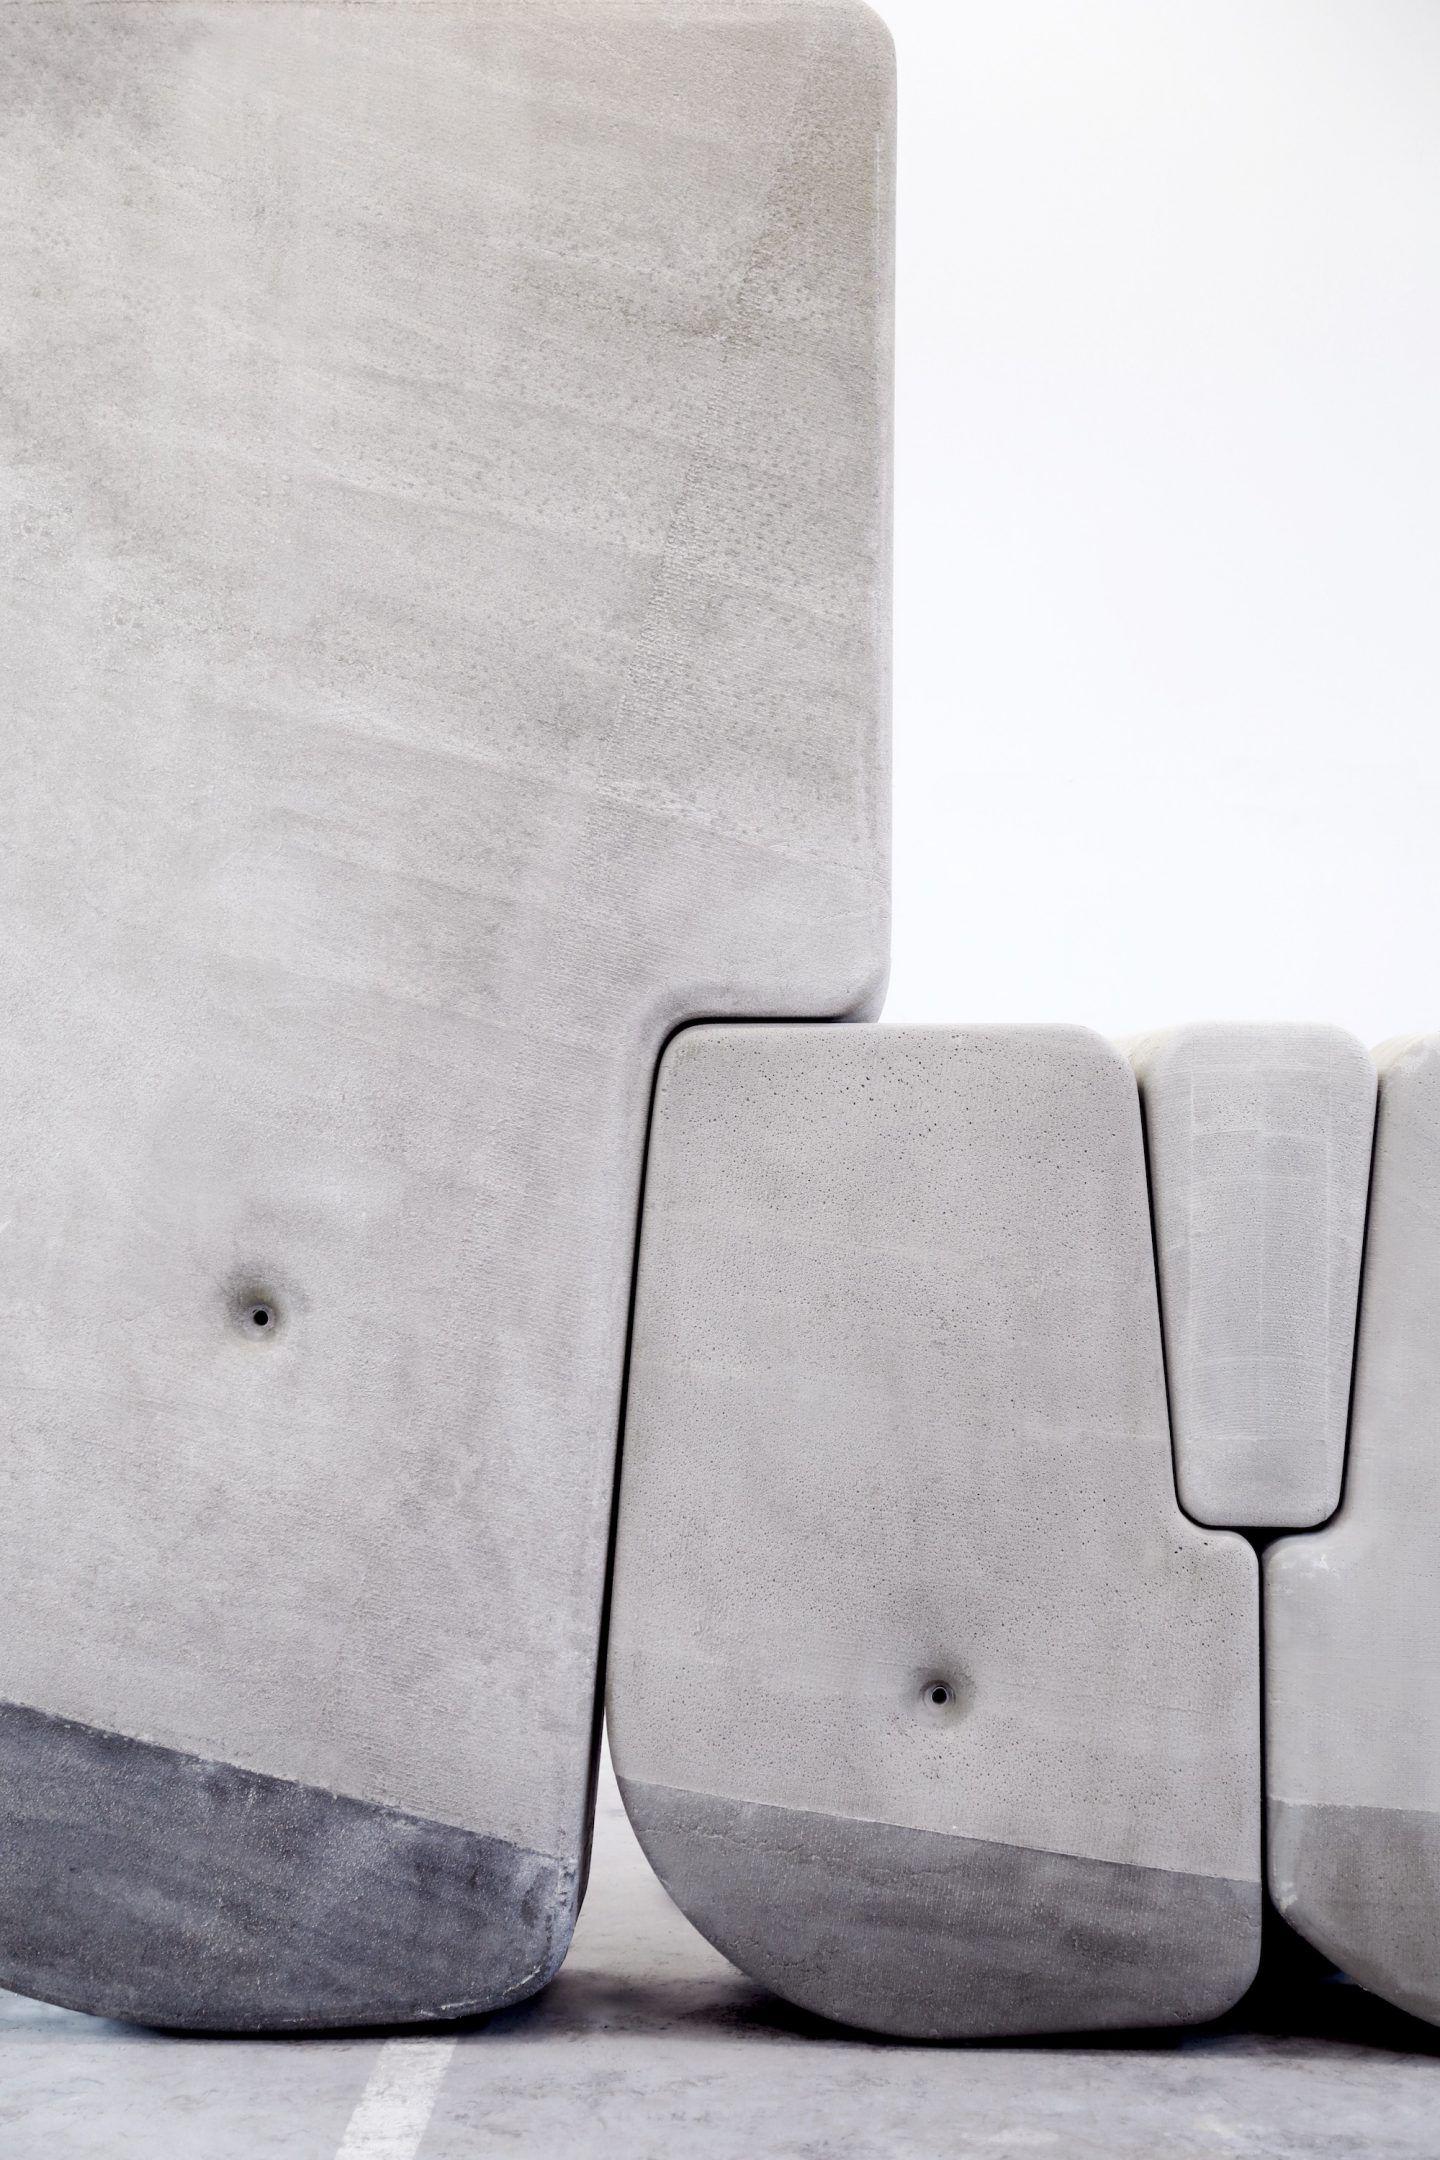 IGNANT-Design-Matter-Design-Studio-Walking-Assembly-011